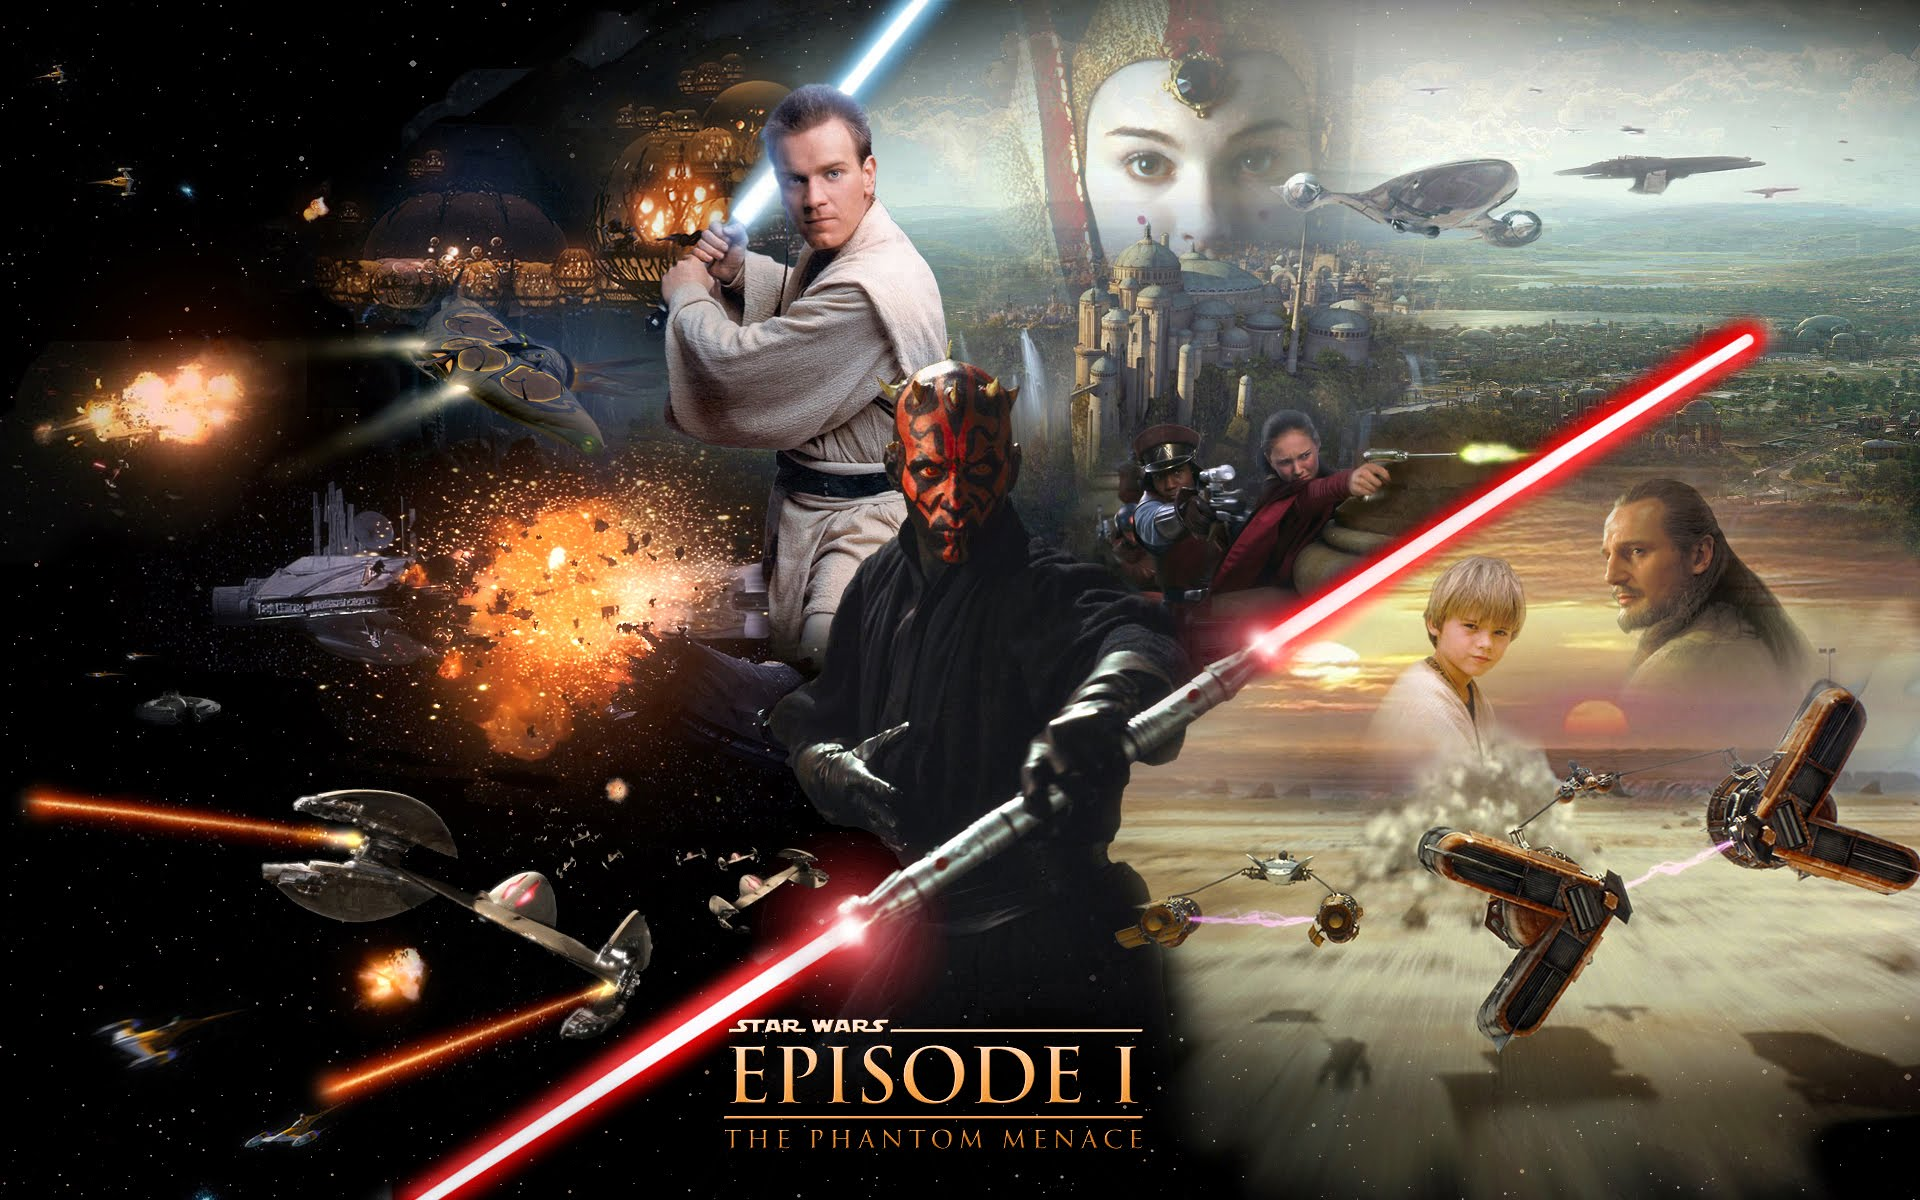 Star Wars Episode I The Phantom Menace Wallpapers Movie Hq Star Wars Episode I The Phantom Menace Pictures 4k Wallpapers 2019